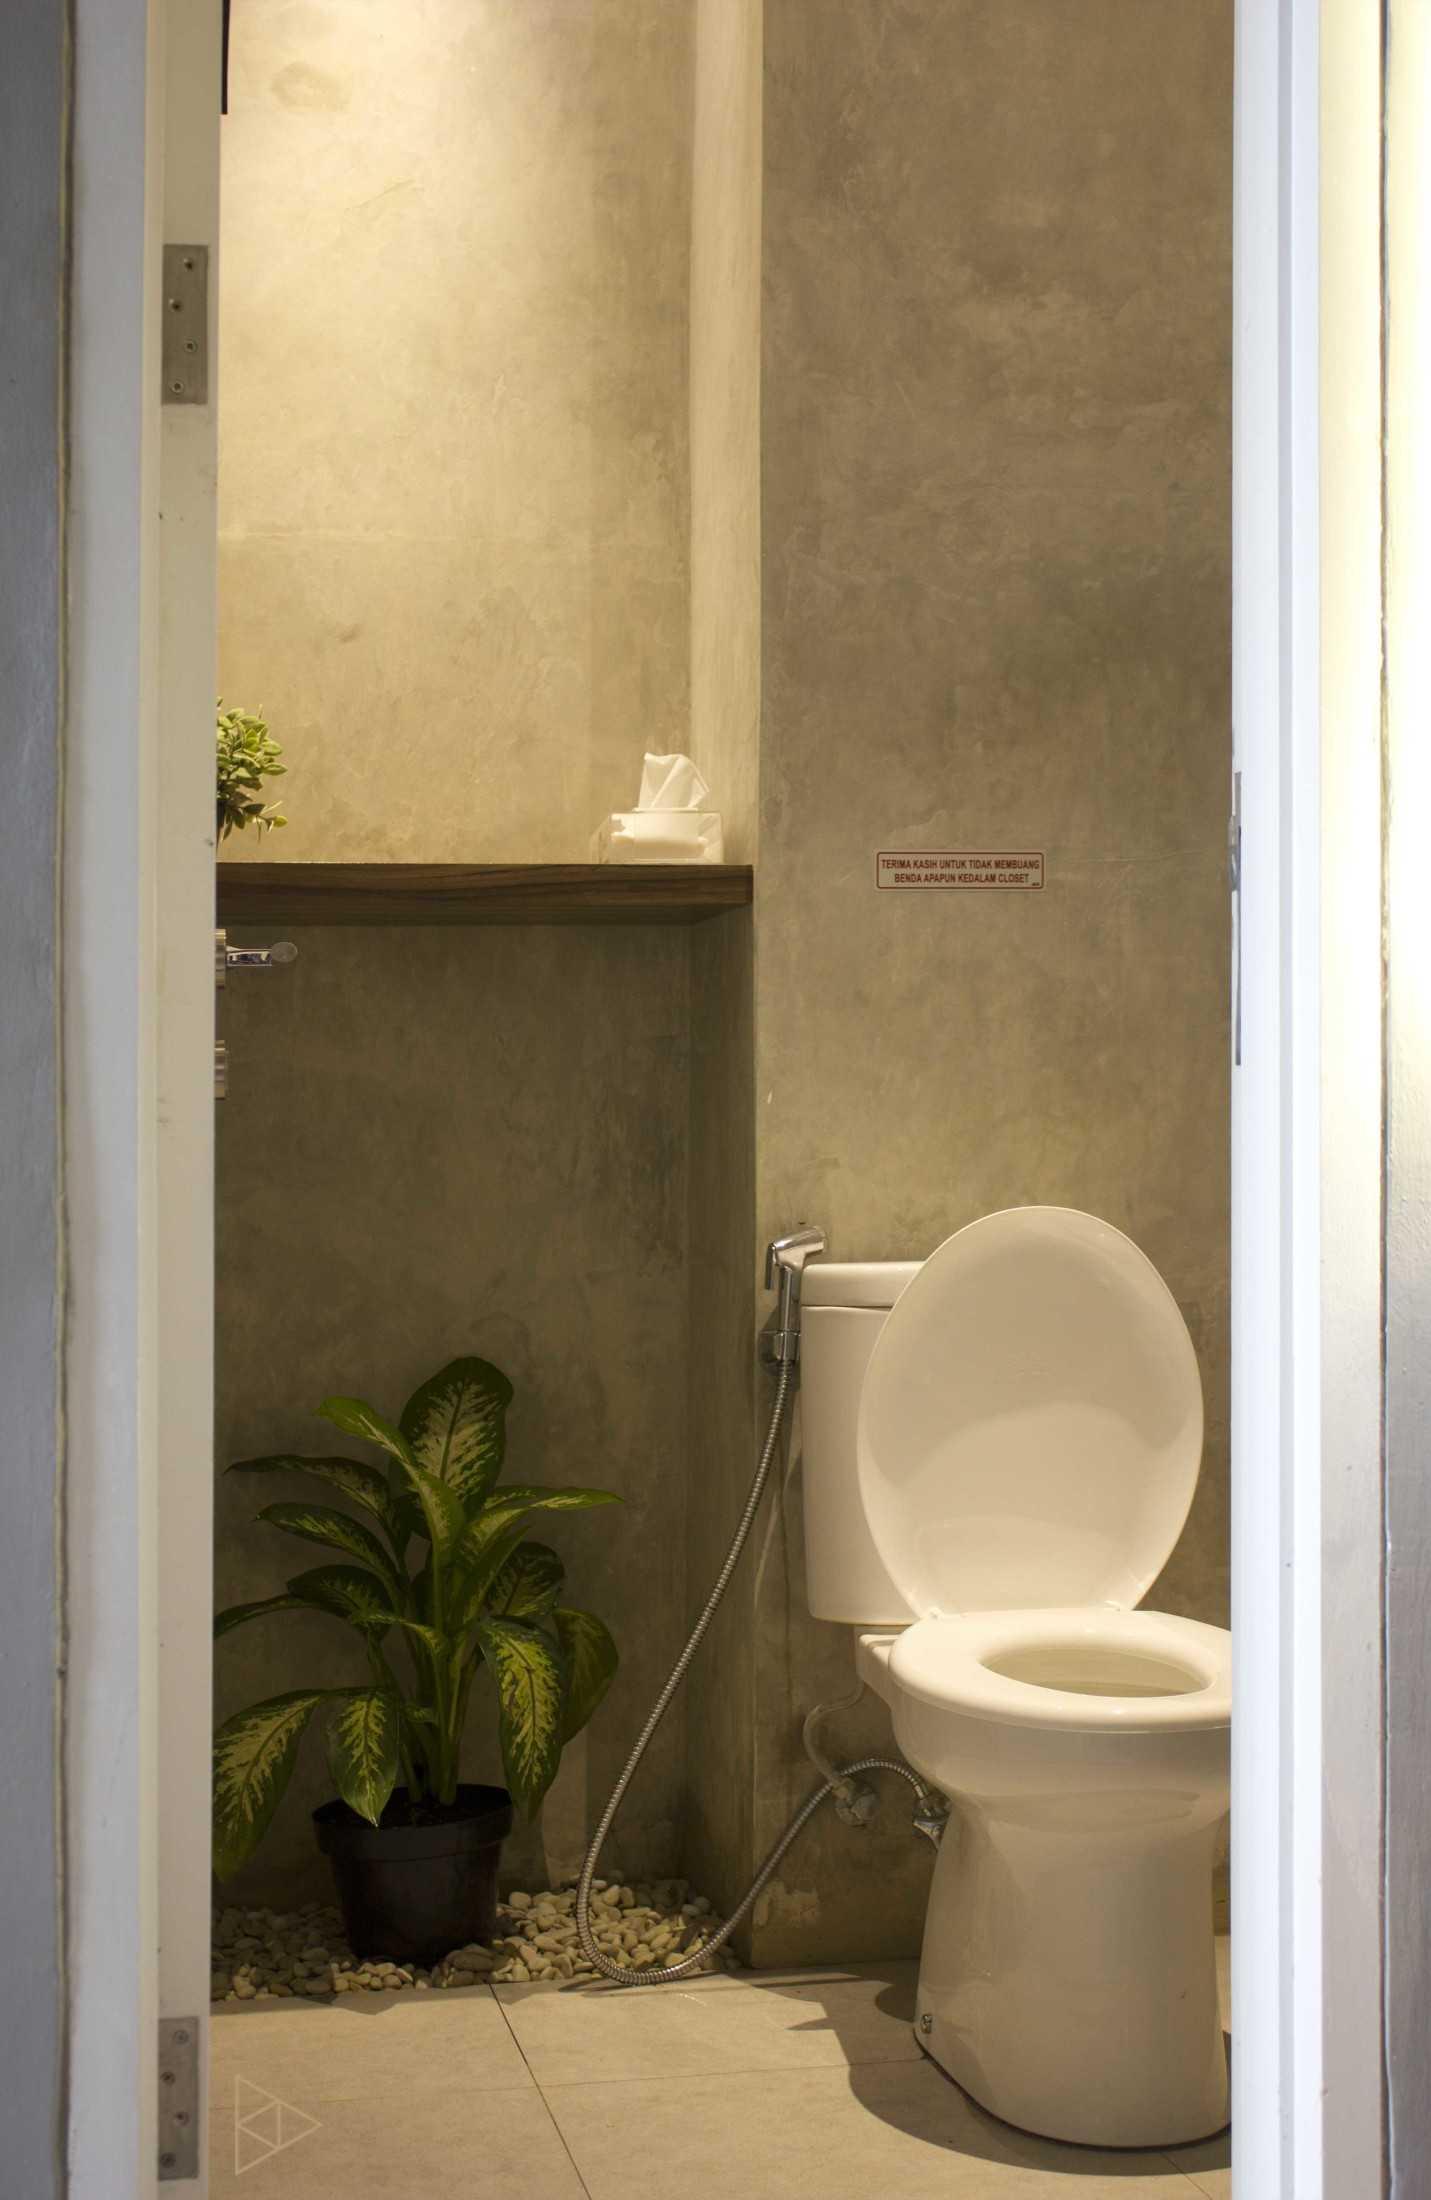 Ties Design & Build 90'S Flazback Cafe Klp. Indah, Kec. Tangerang, Kota Tangerang, Banten, Indonesia Klp. Indah, Kec. Tangerang, Kota Tangerang, Banten, Indonesia Toilet - 2Nd Floor  68658